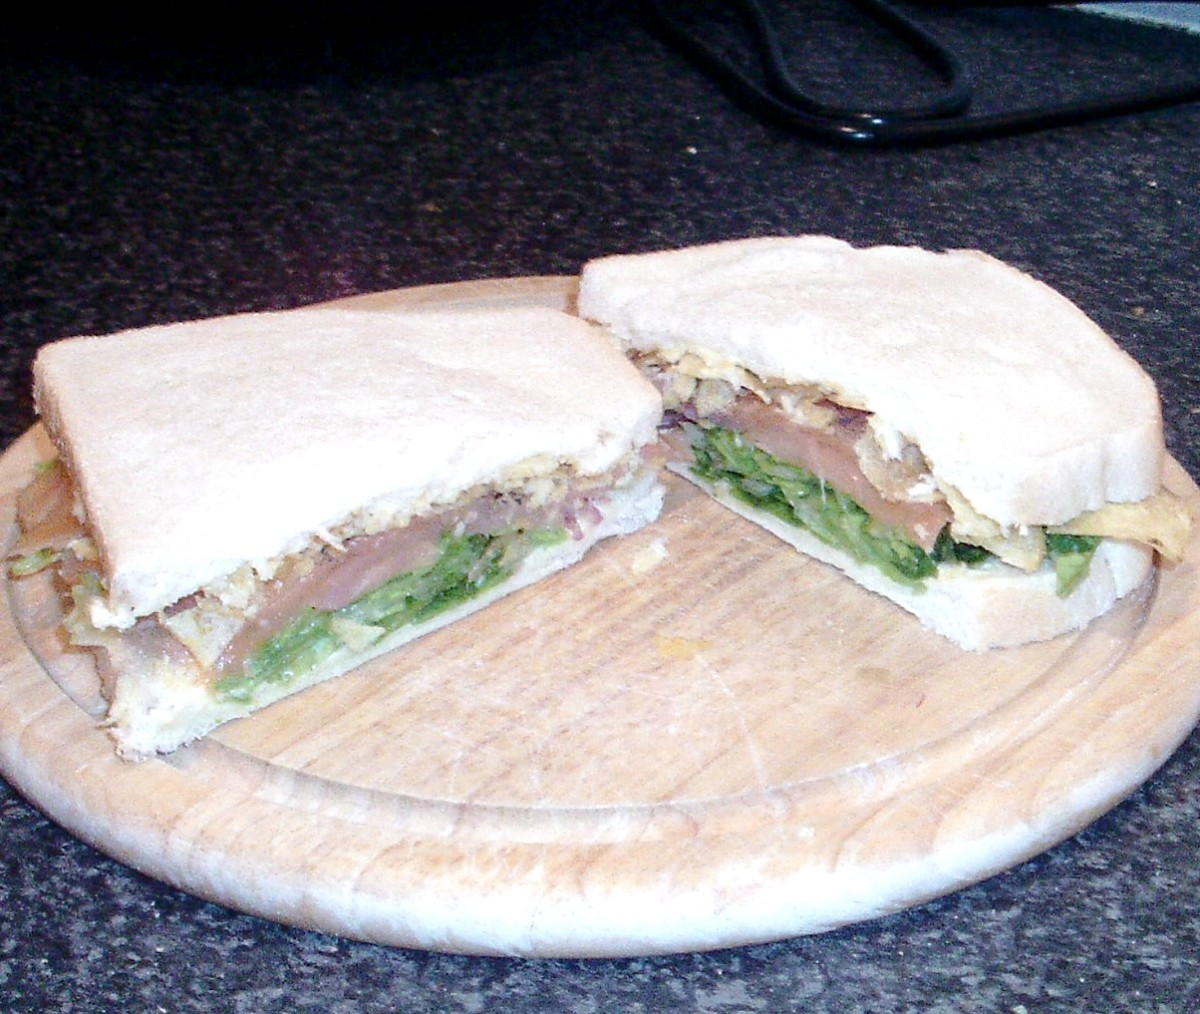 Smoked salmon, balsamic seasoned salad and crisps sandwich